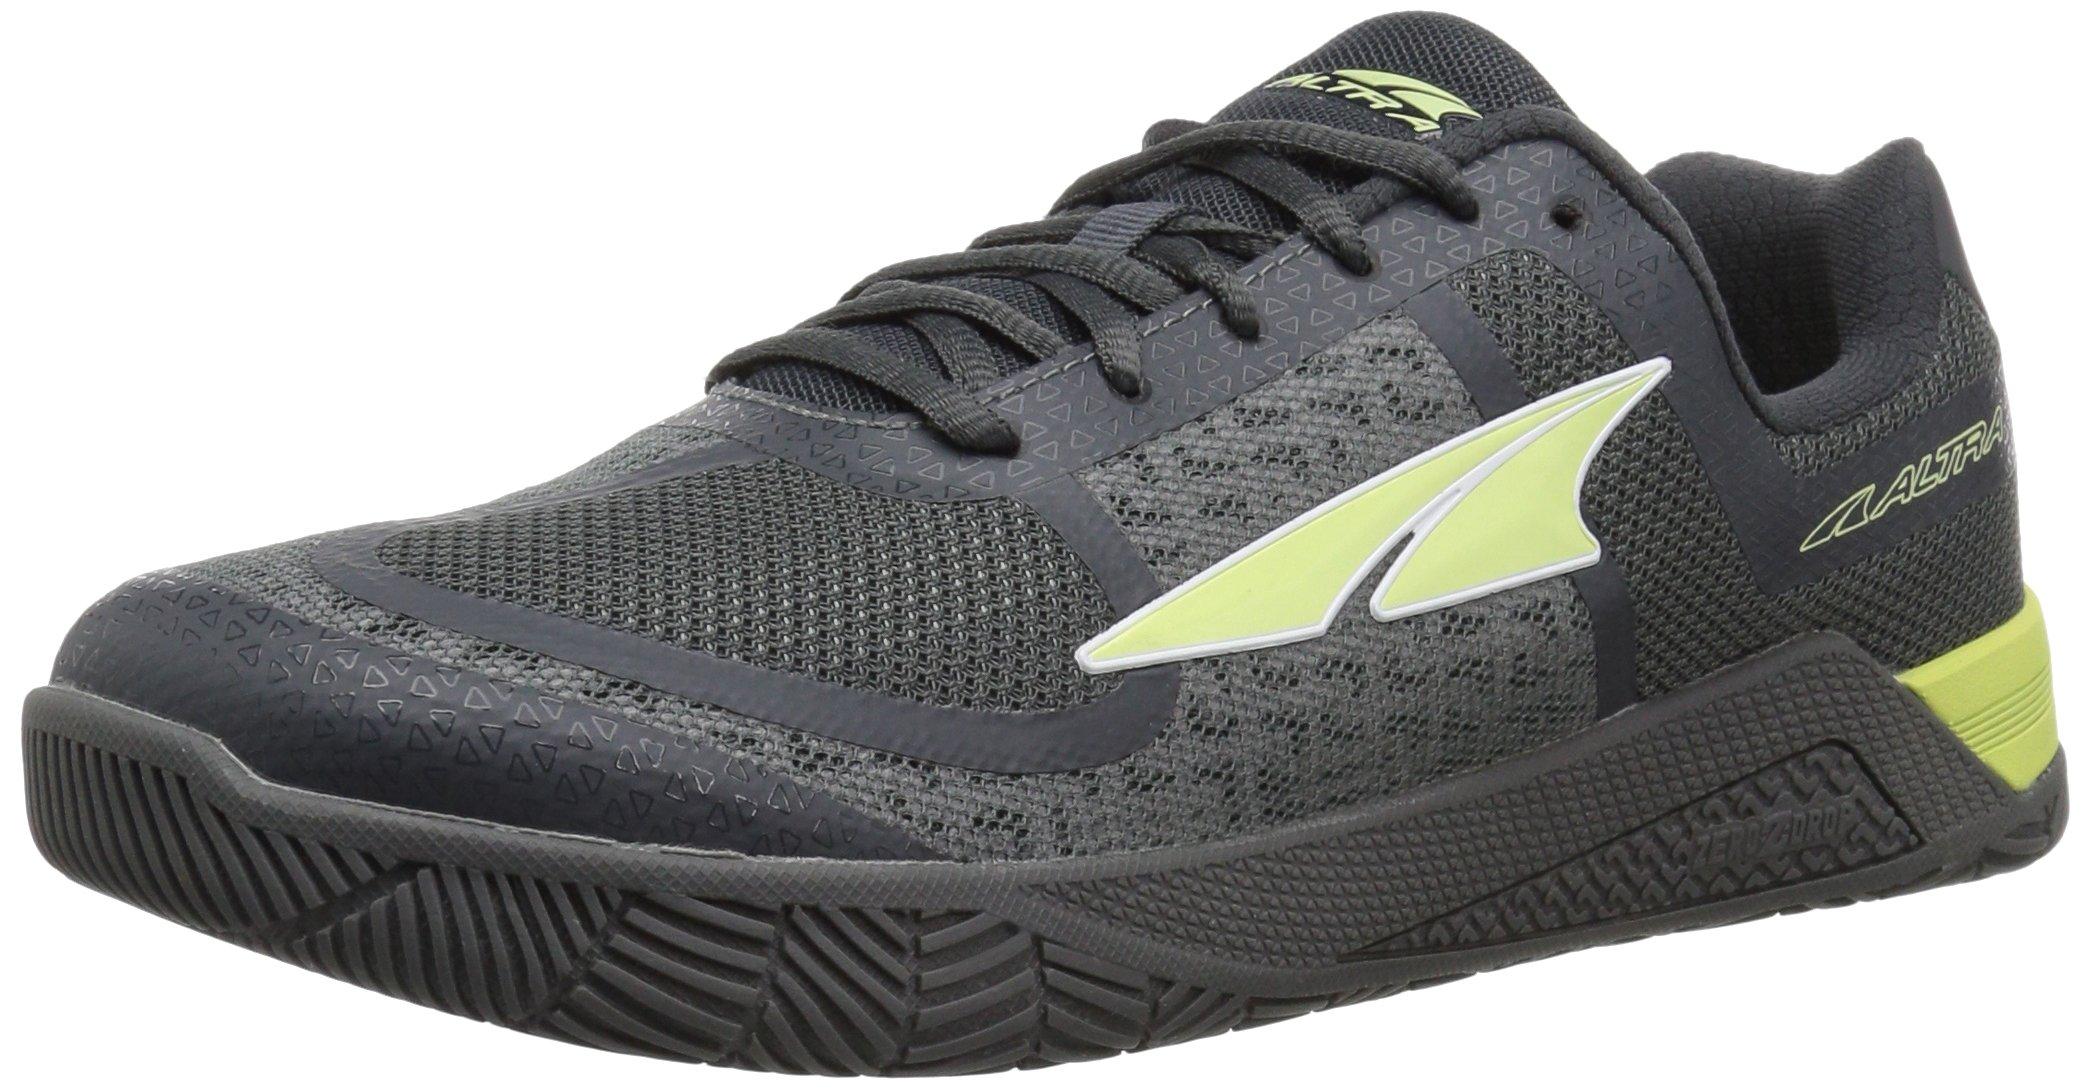 Altra Women's HIIT XT Cross-Training Shoe, Gray/Lime, 7.5